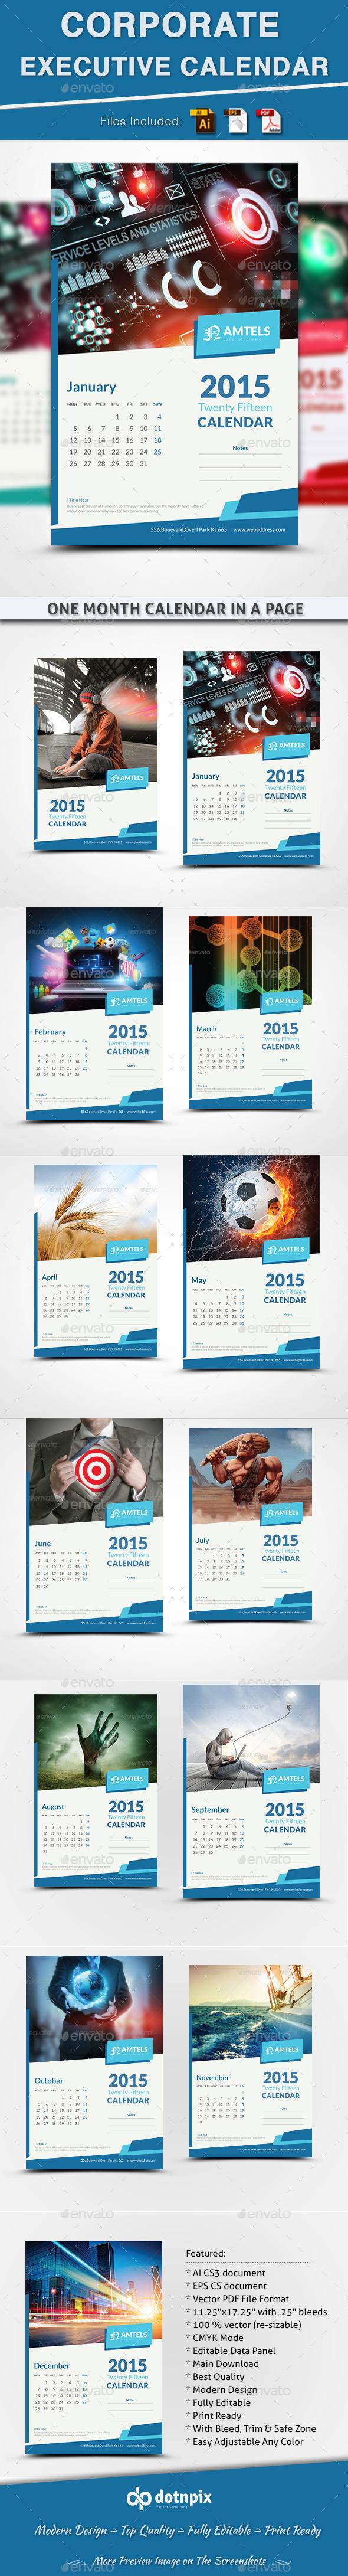 Corporate Executive Calendar - Calendars Stationery